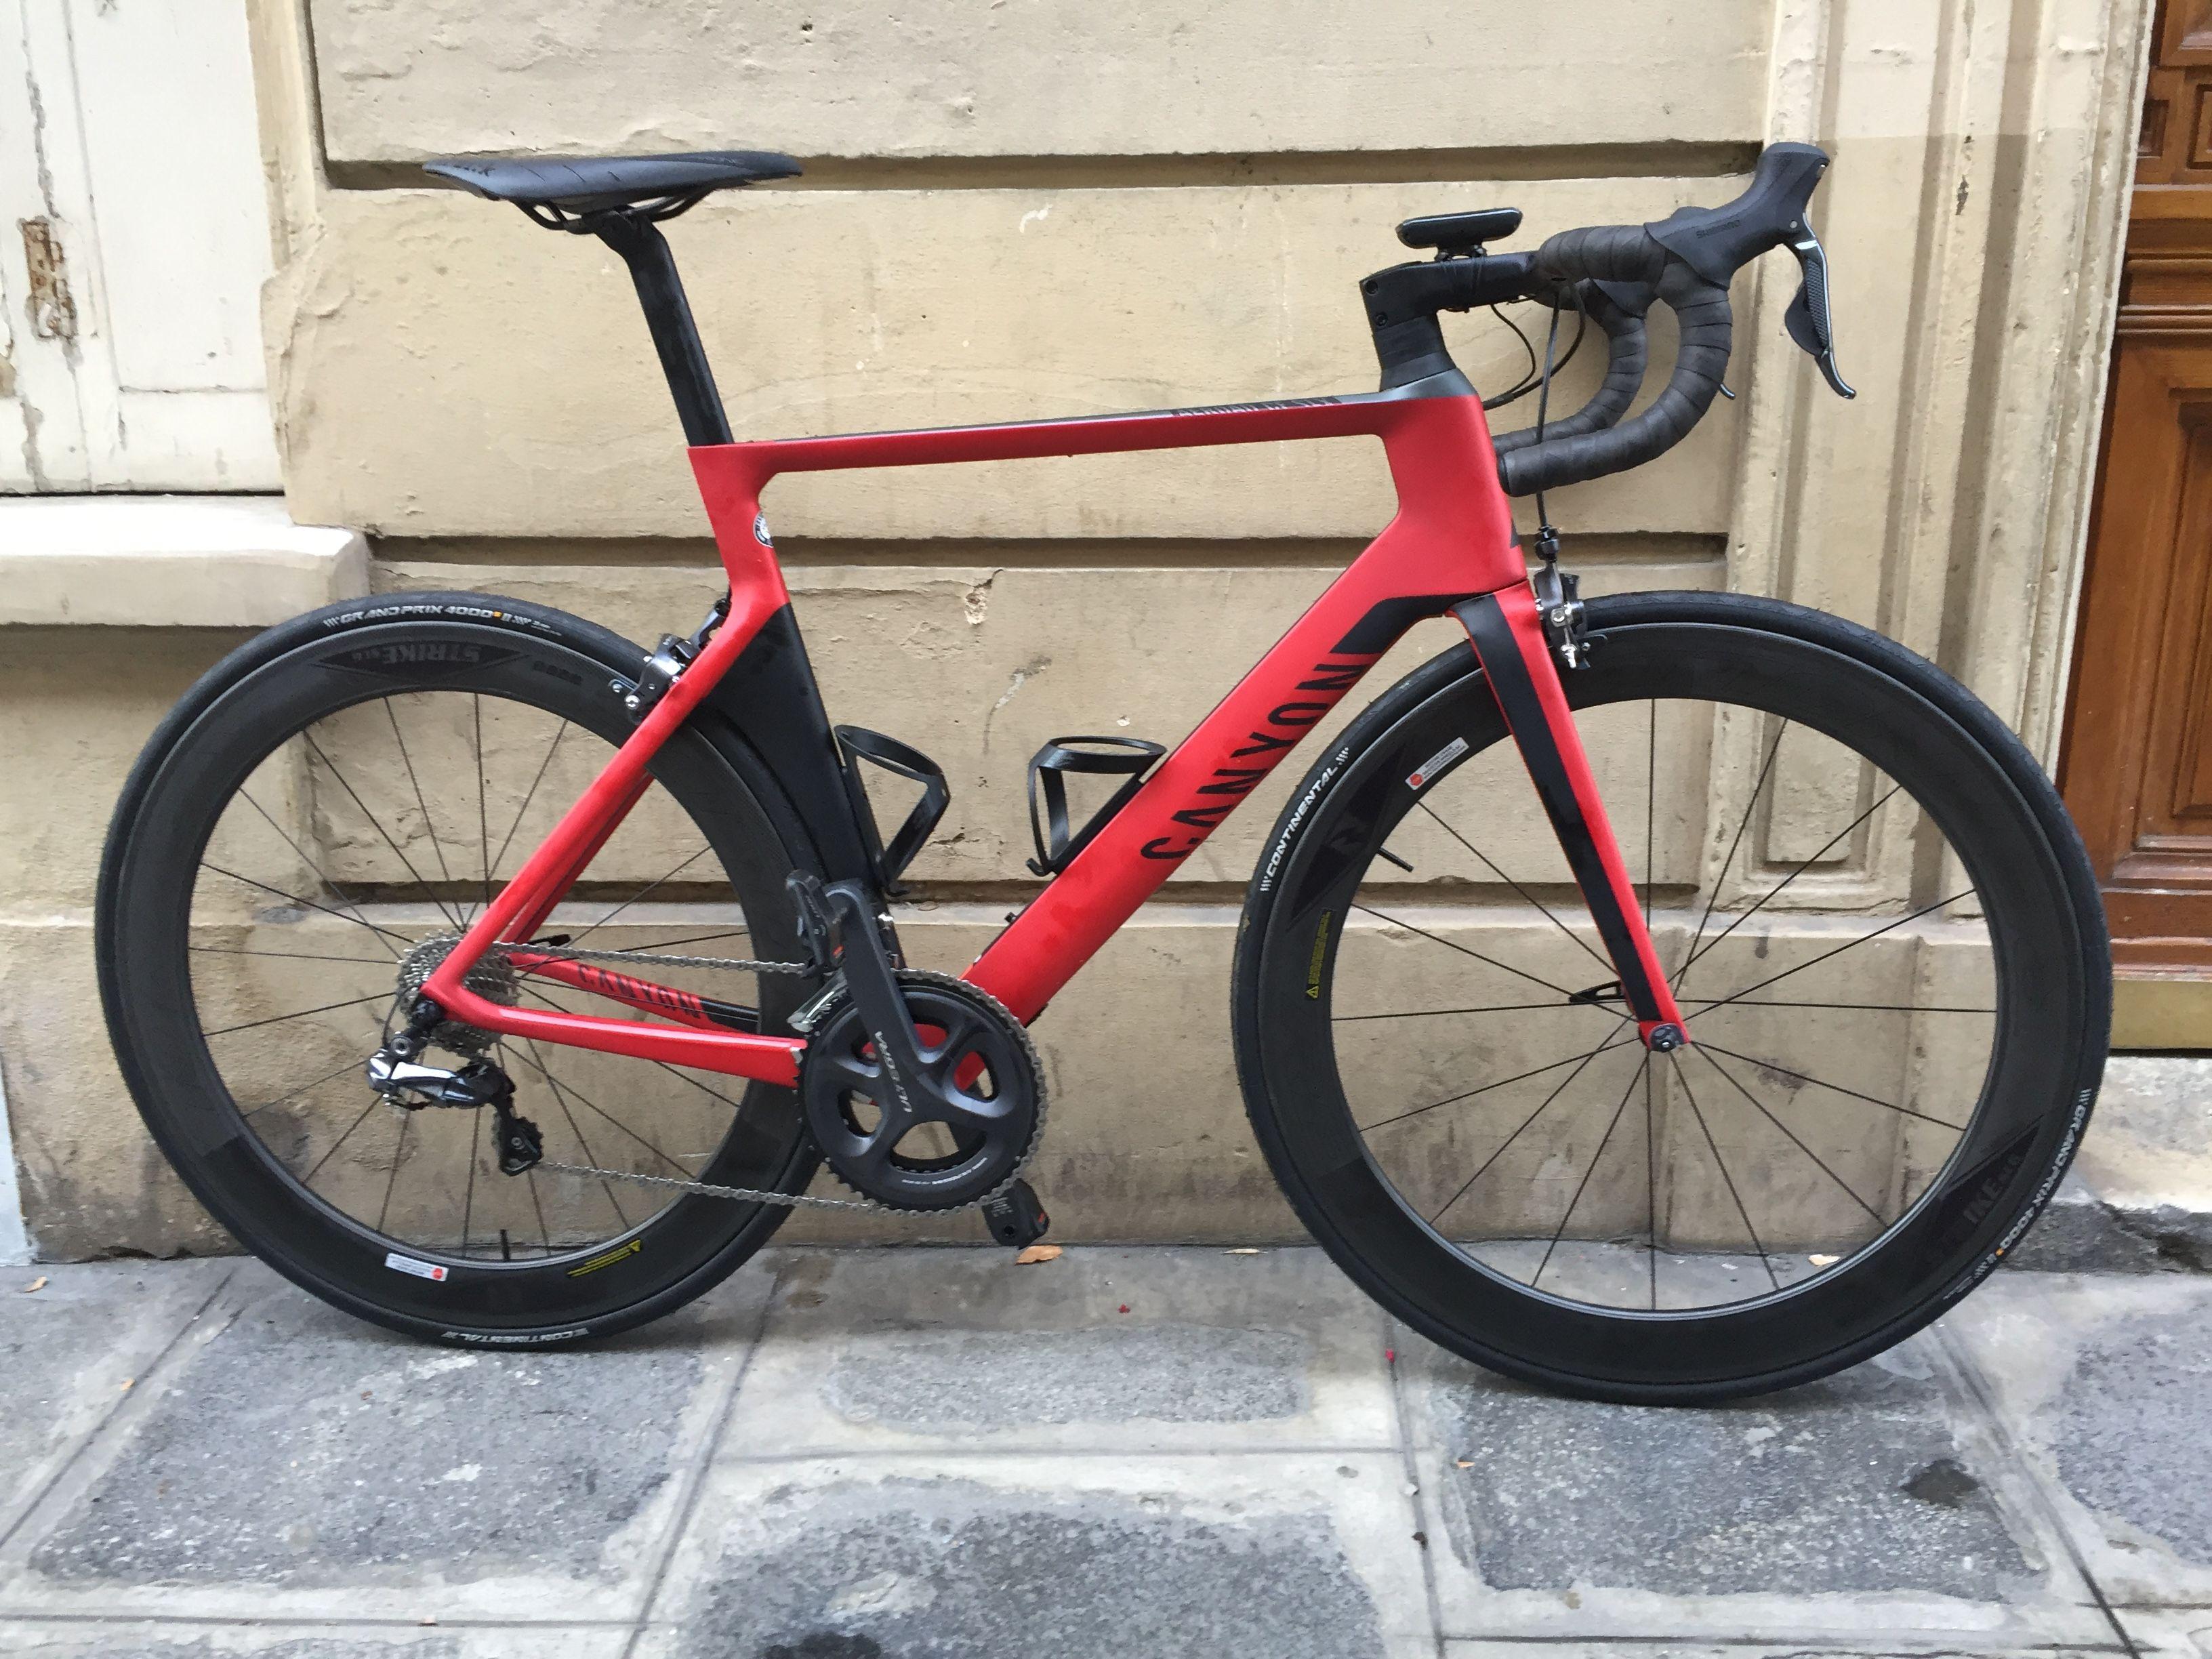 b06924b30fc Canyon Aeroad CF SLX 8.0 DI2 - 2016 | Cycling | Road bikes, Canyon ...